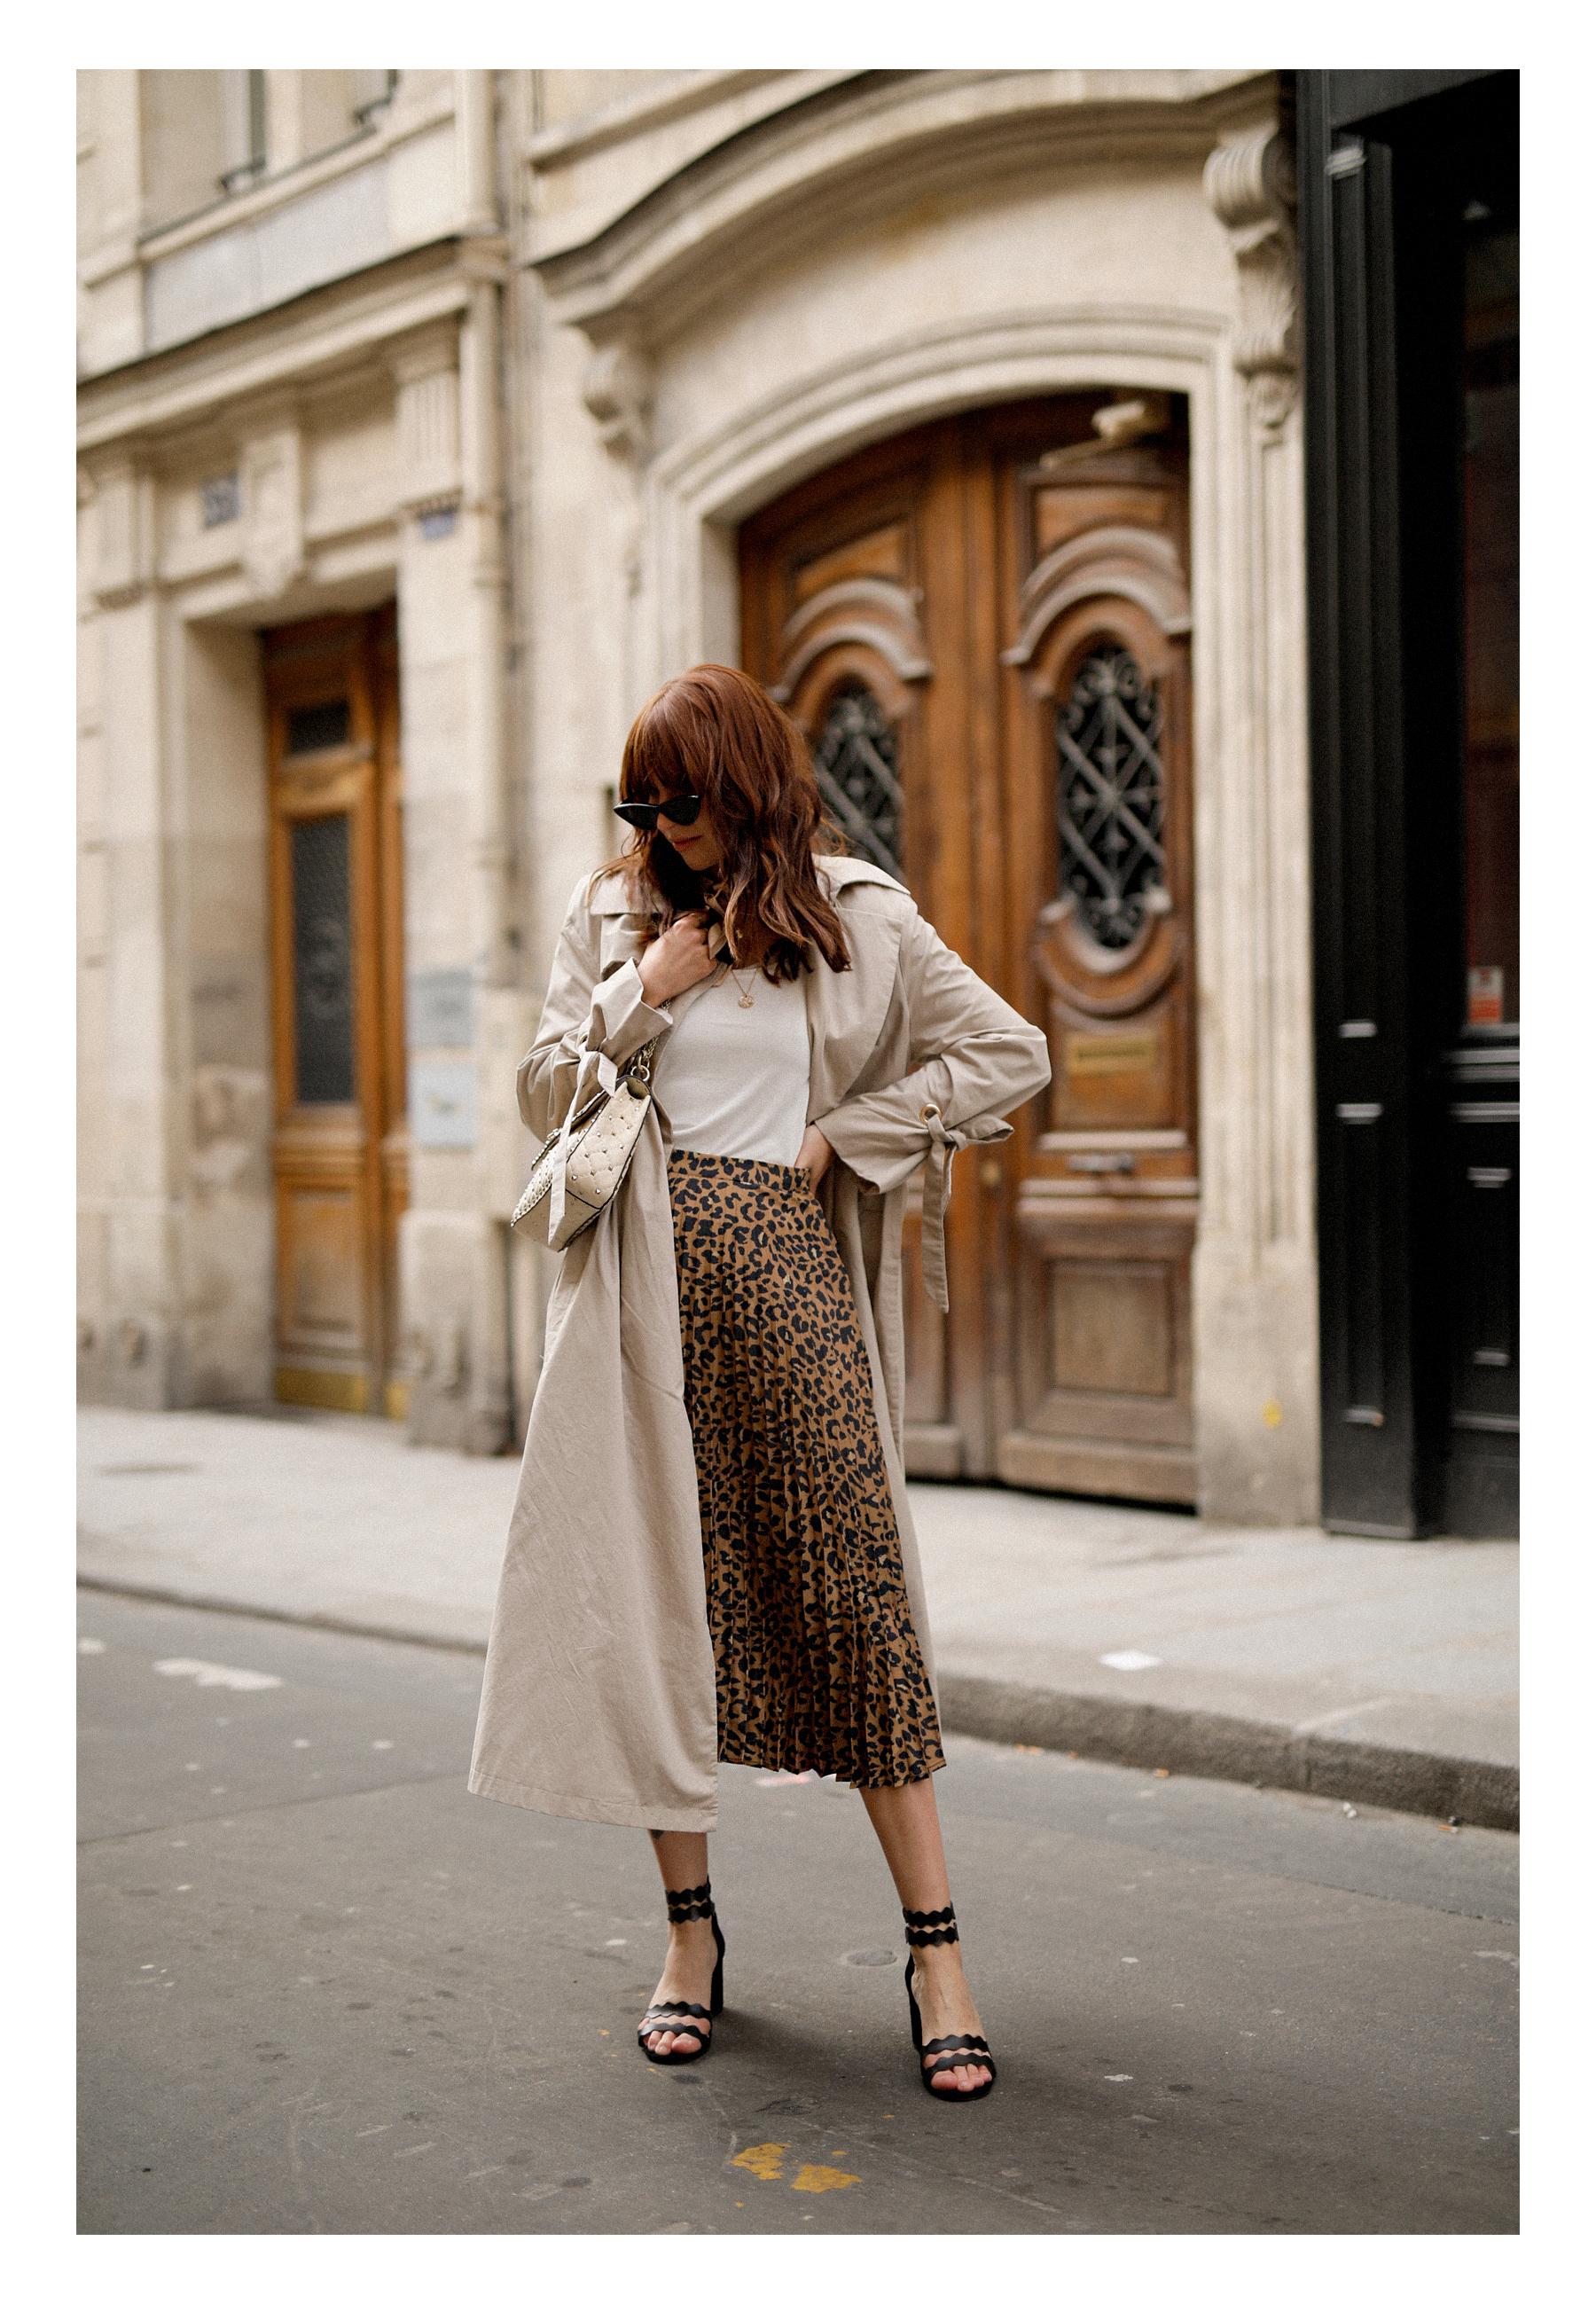 paris love mon amour mint&berry leopard print skirt trench coat valentino rockstud breuninger catsanddogsblog modeblogger styleblog modeblog outfitblog parisienne styliste cats&dogs max bechmann fotografie film düsseldorf 6